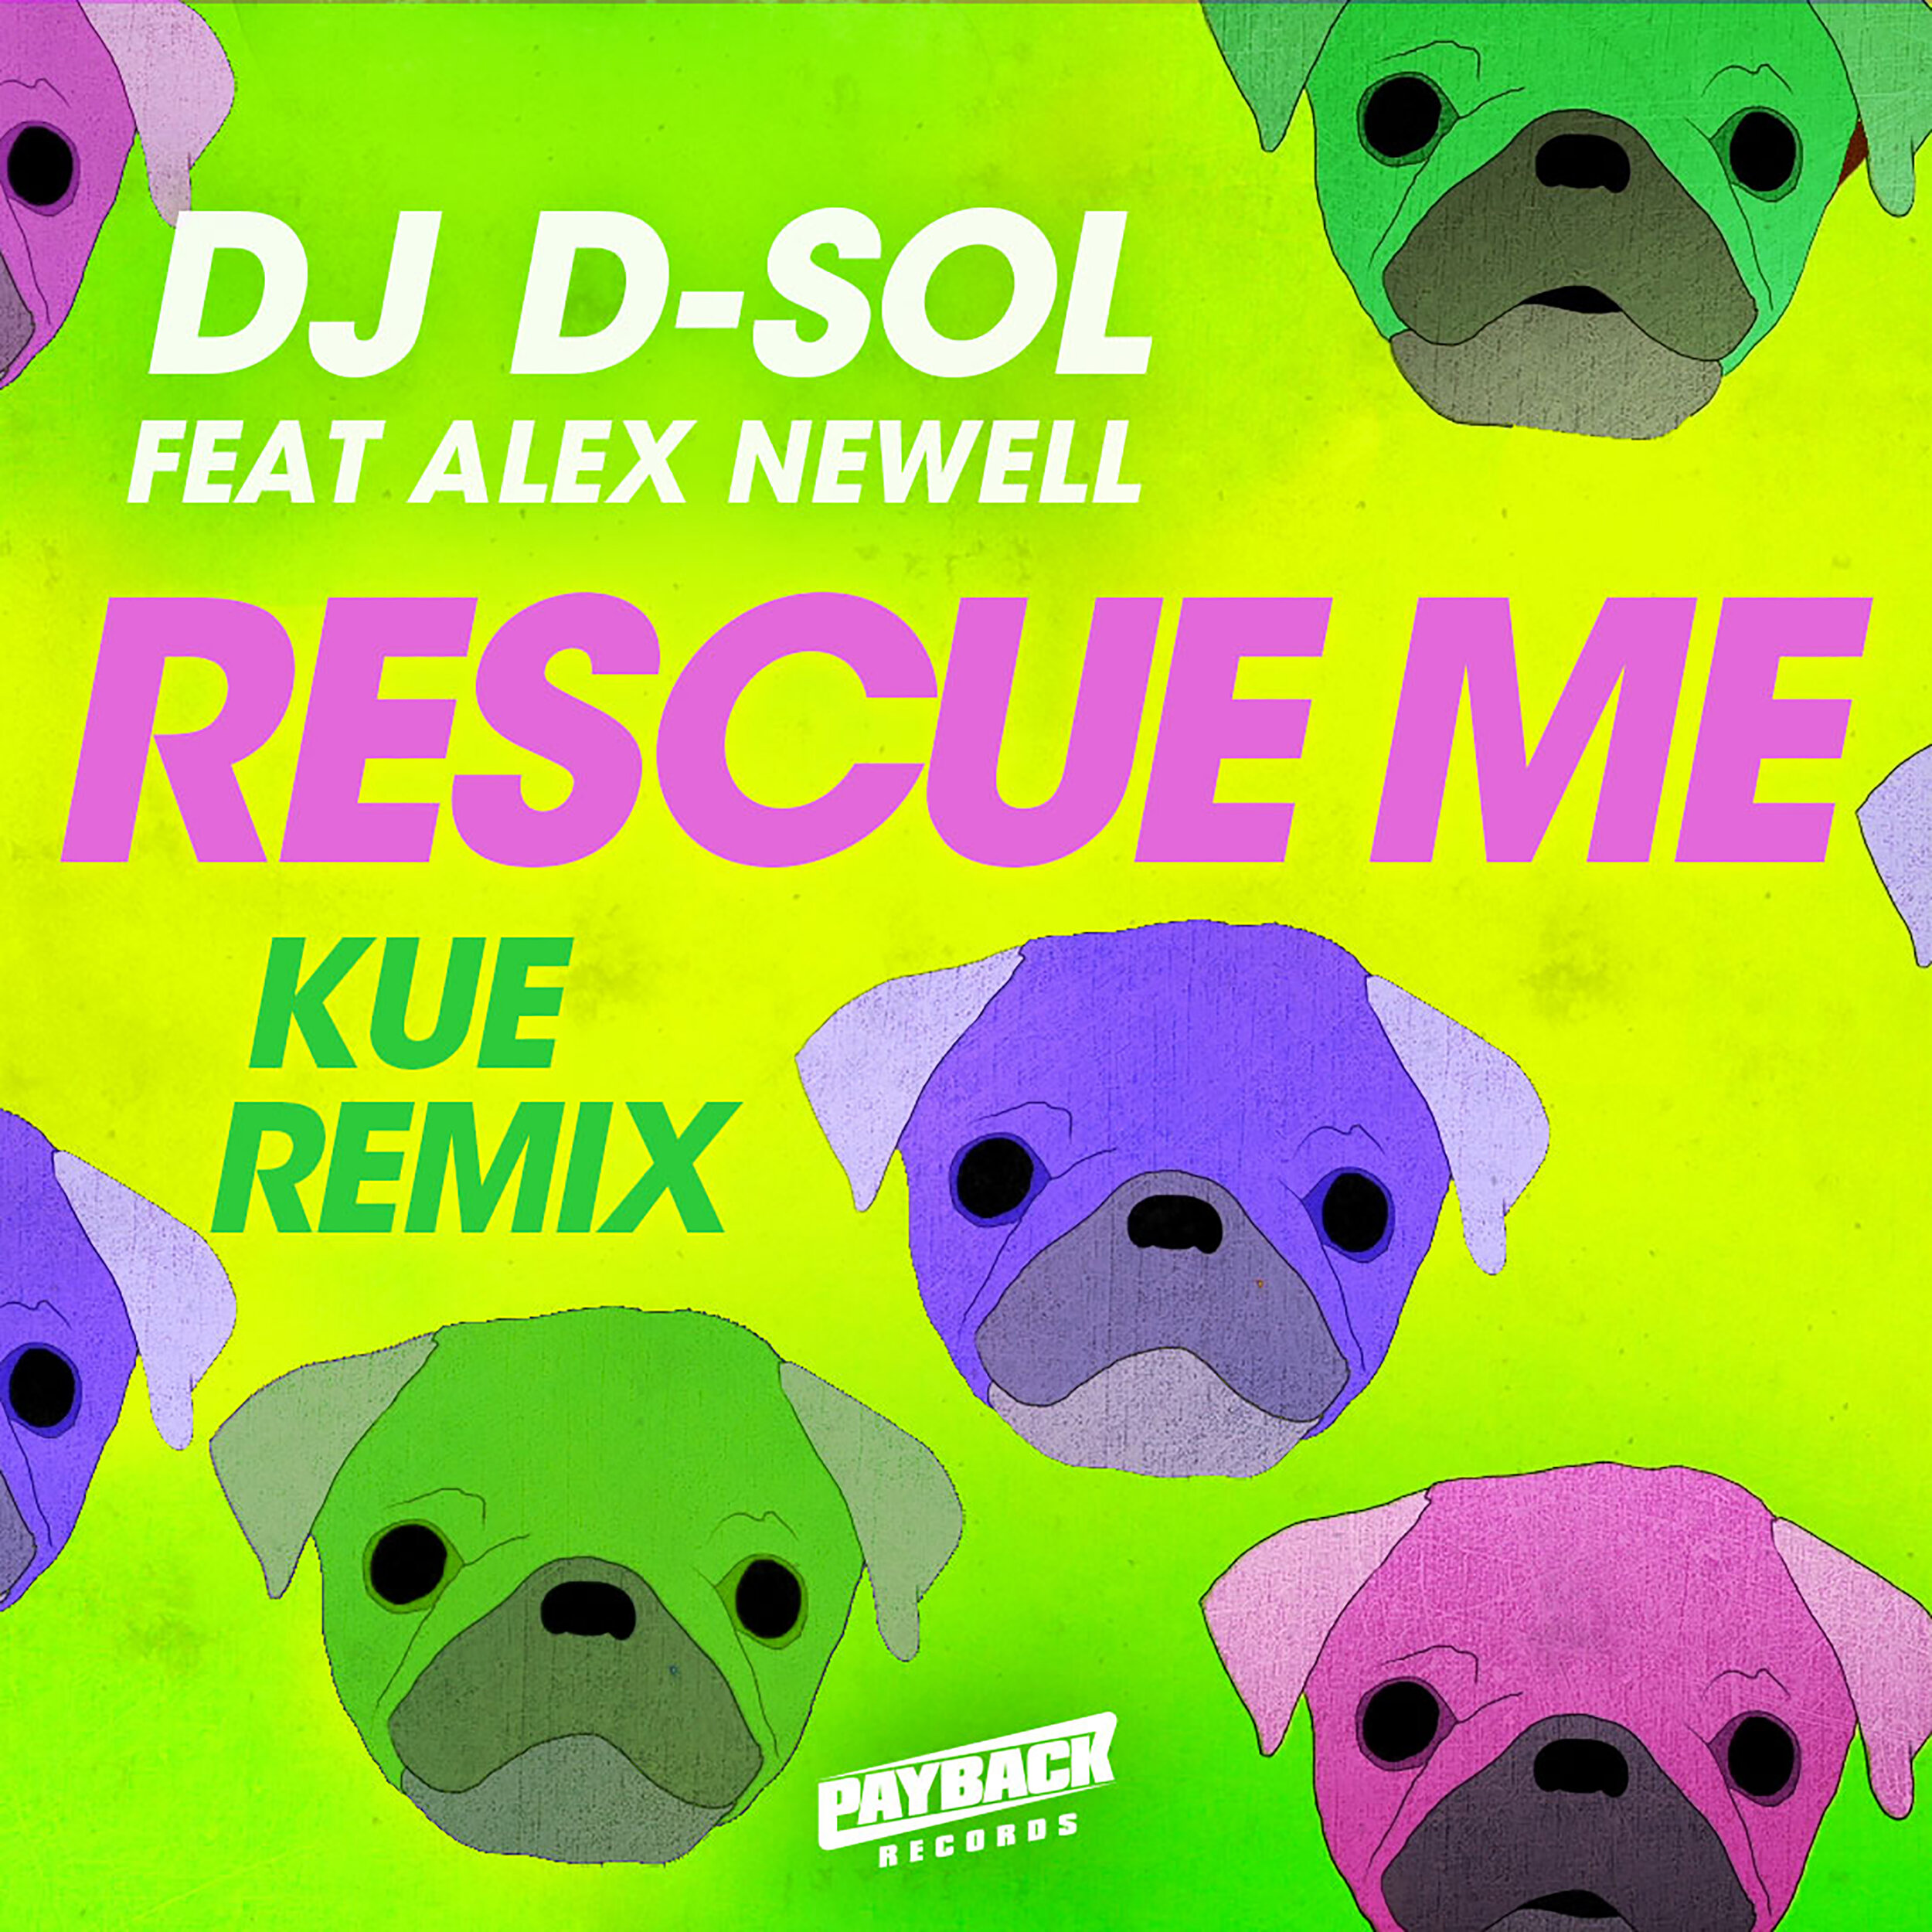 D-Sol_Rescue-Me_REMIX_Kue_3K.jpg